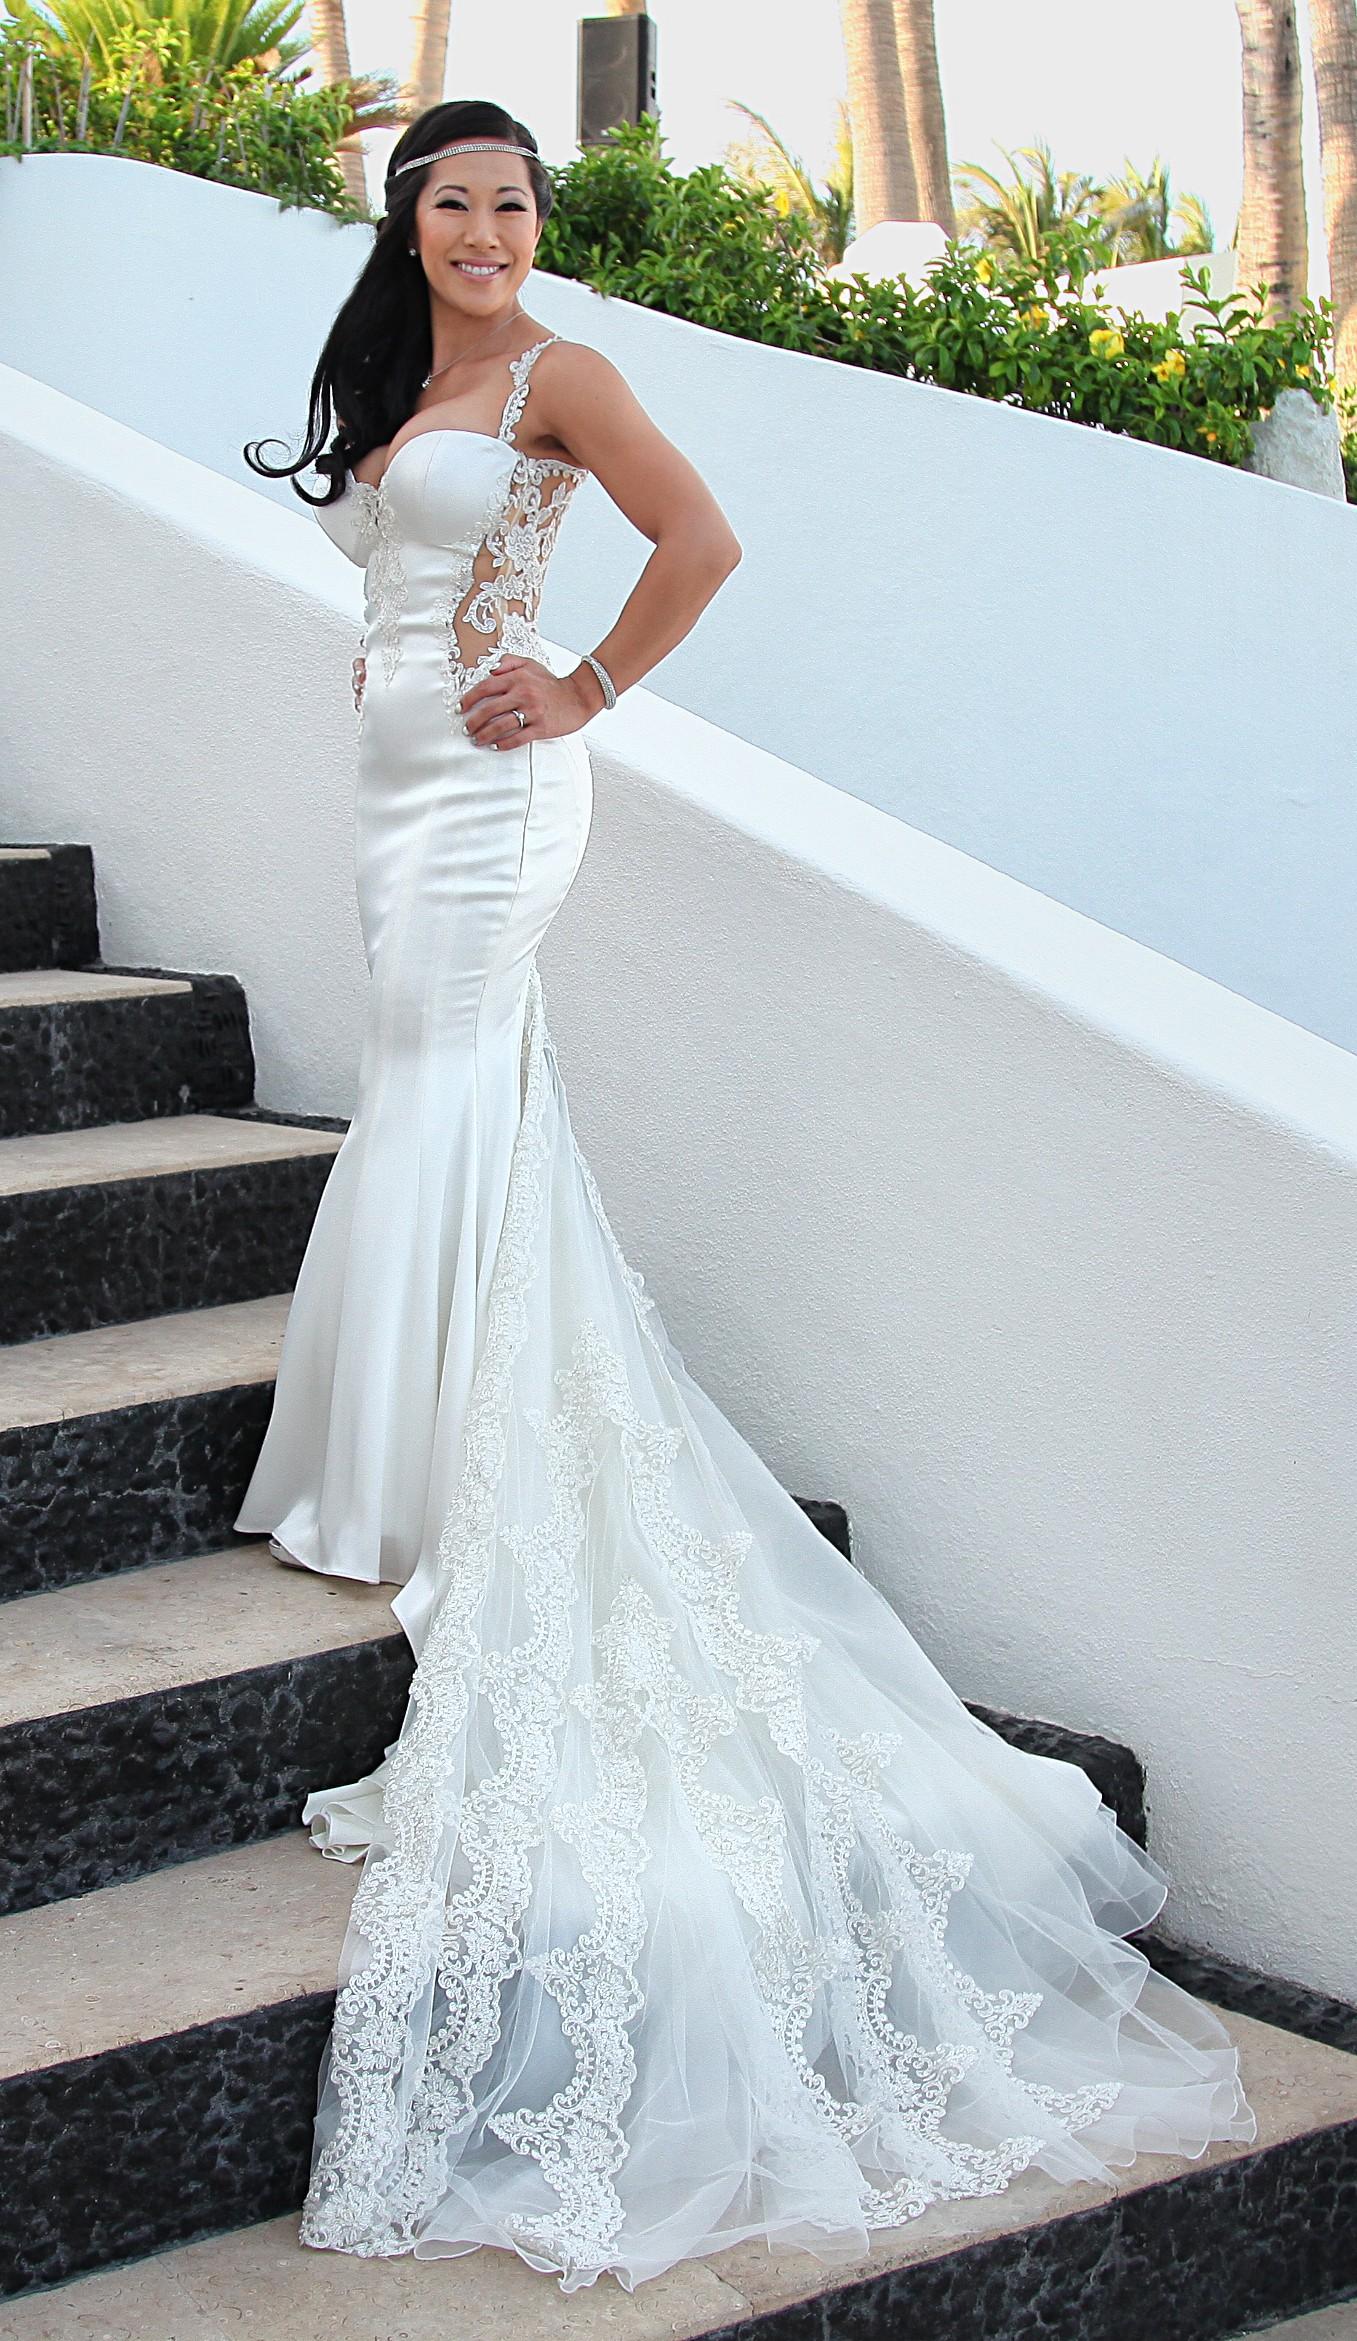 Galia lahav antonia second hand wedding dress on sale 59 off for Second hand wedding dresses san diego